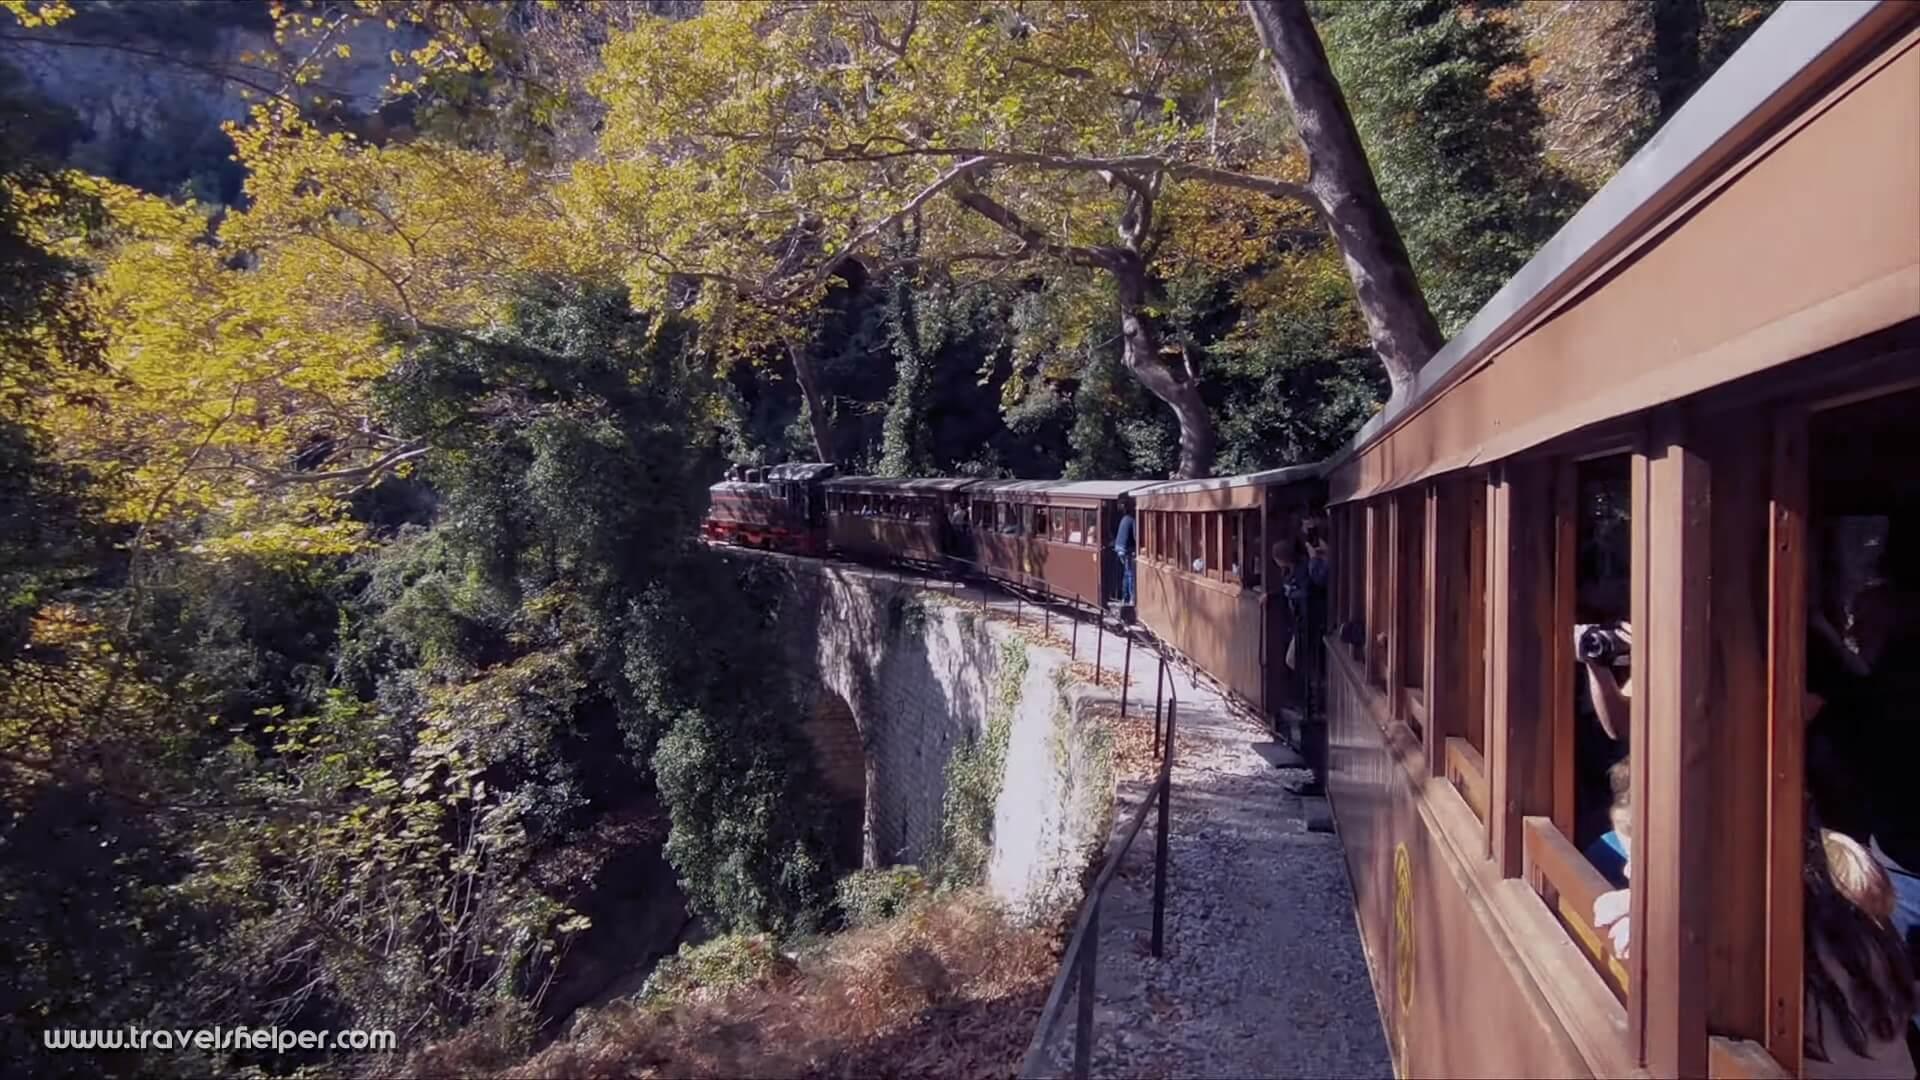 Legendary steam train Mucuris in pelion, Greece